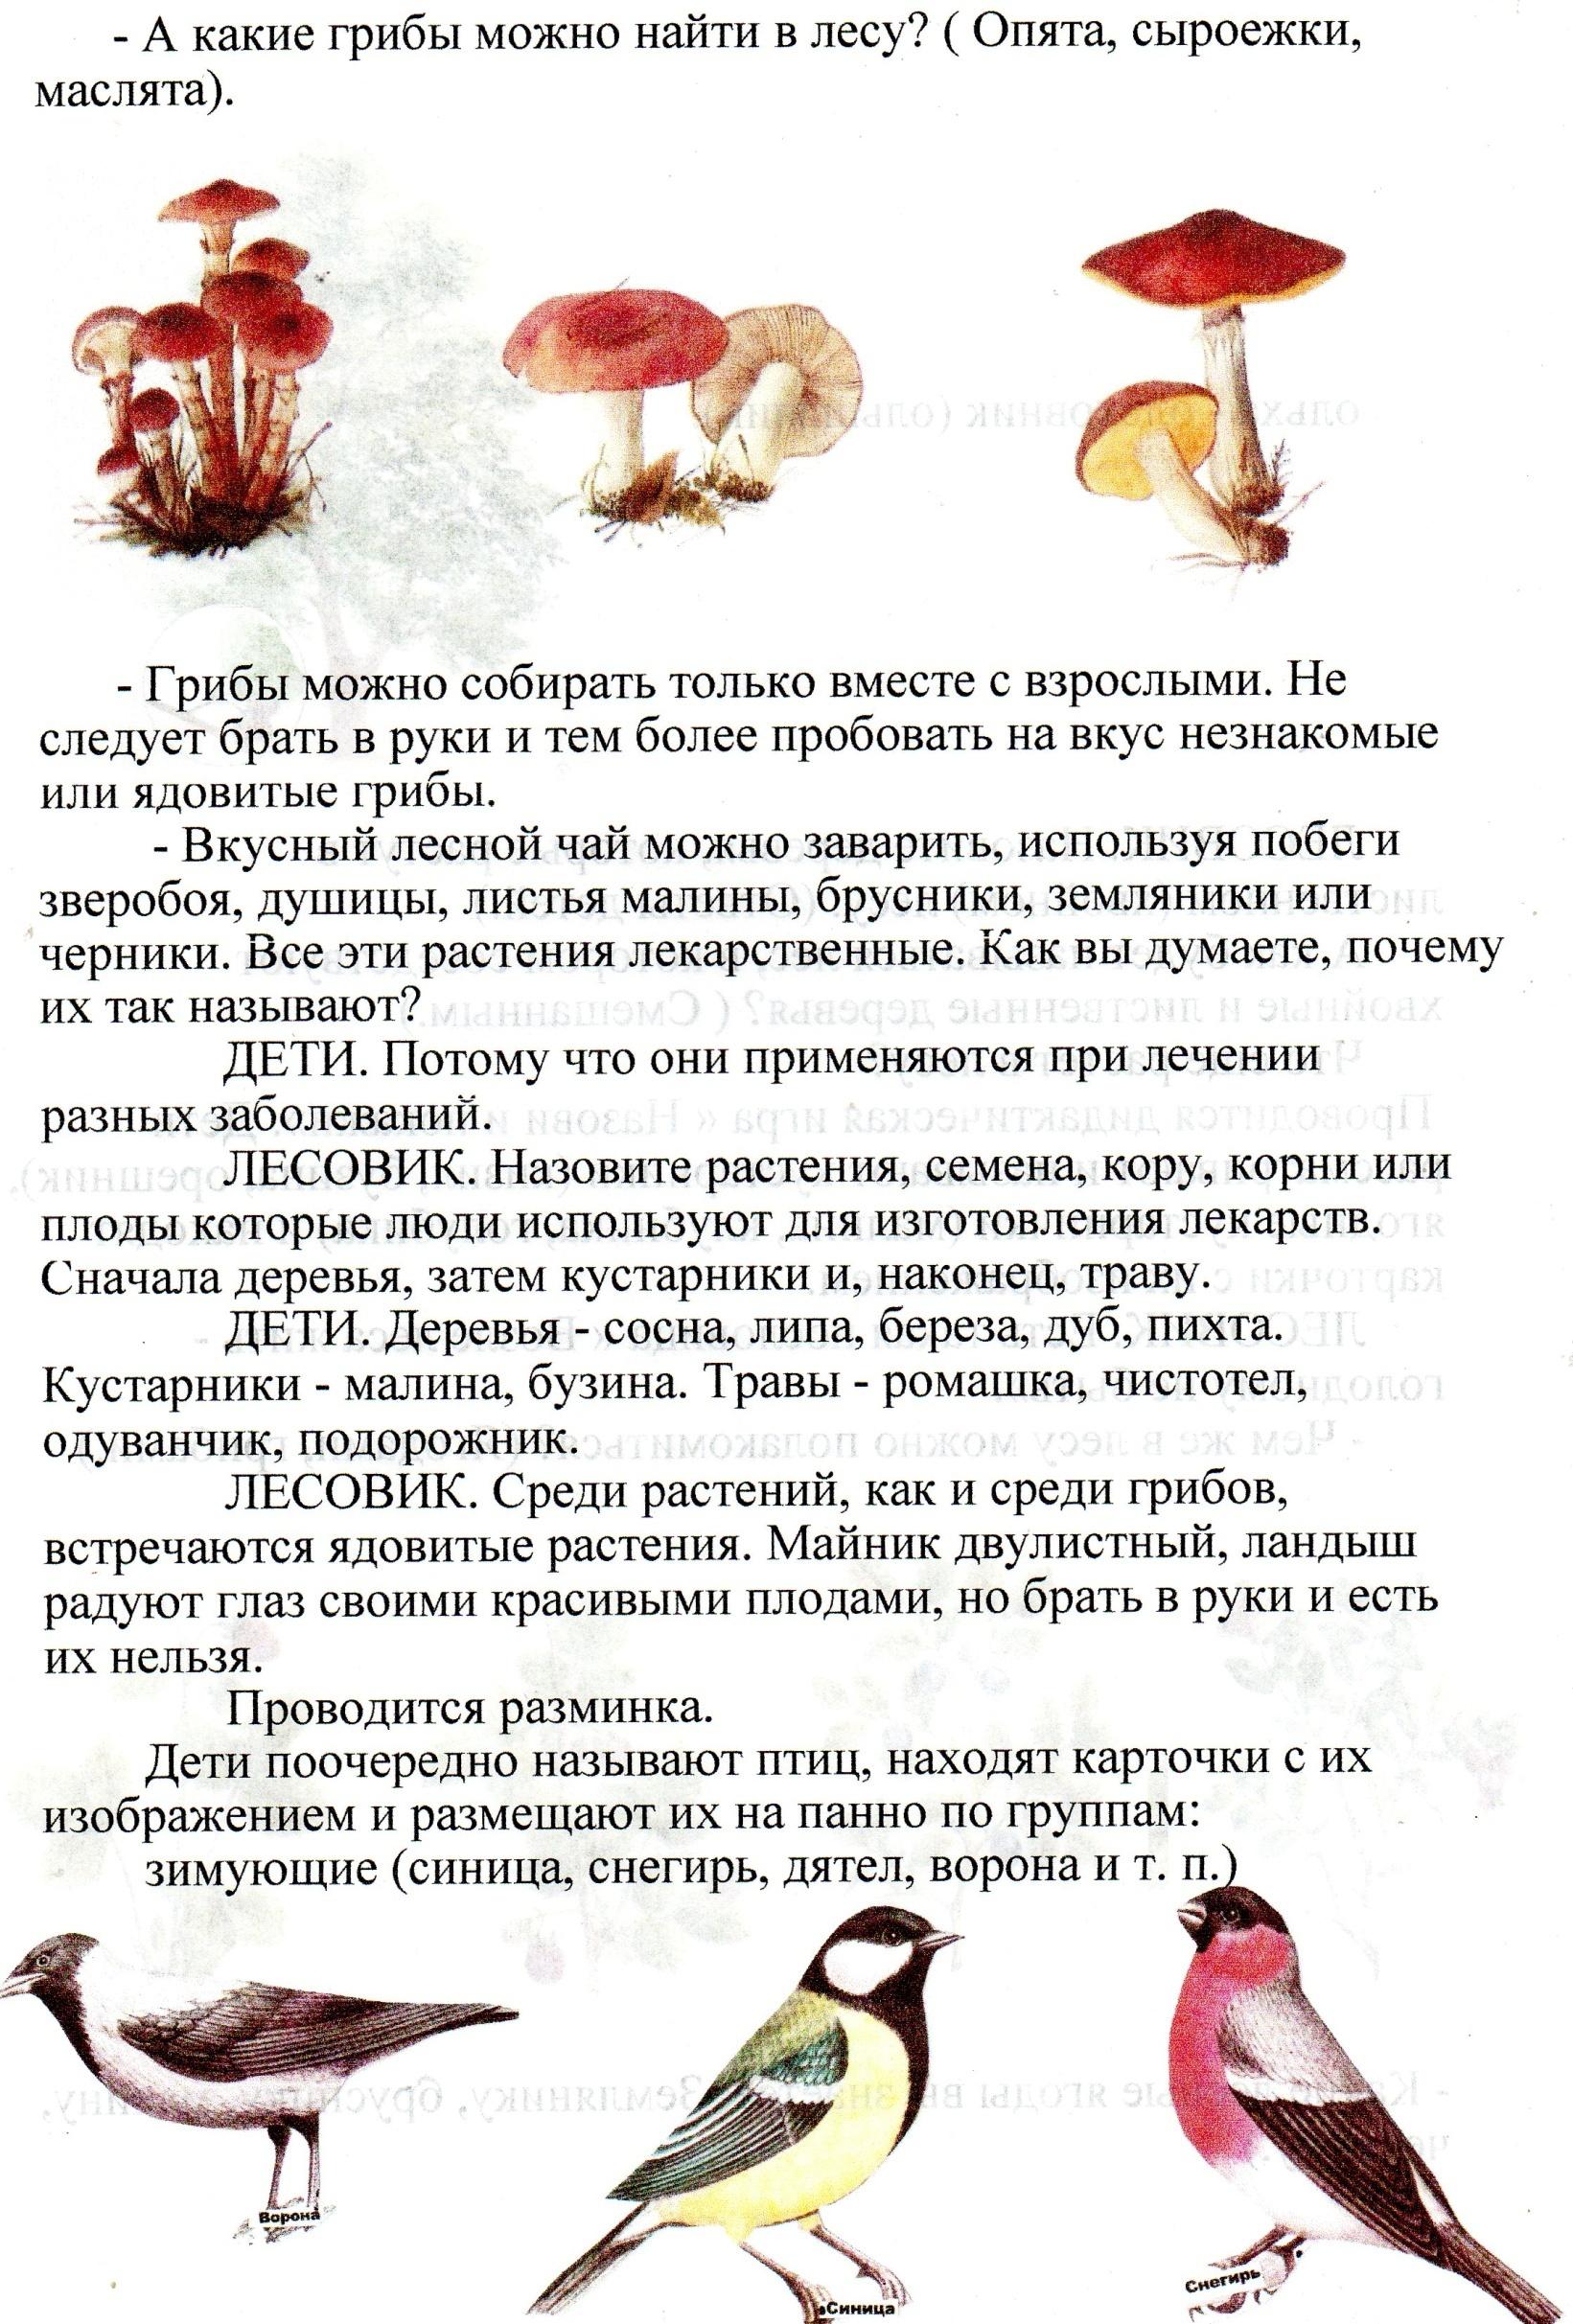 C:\Users\Александр\Pictures\img030.jpg